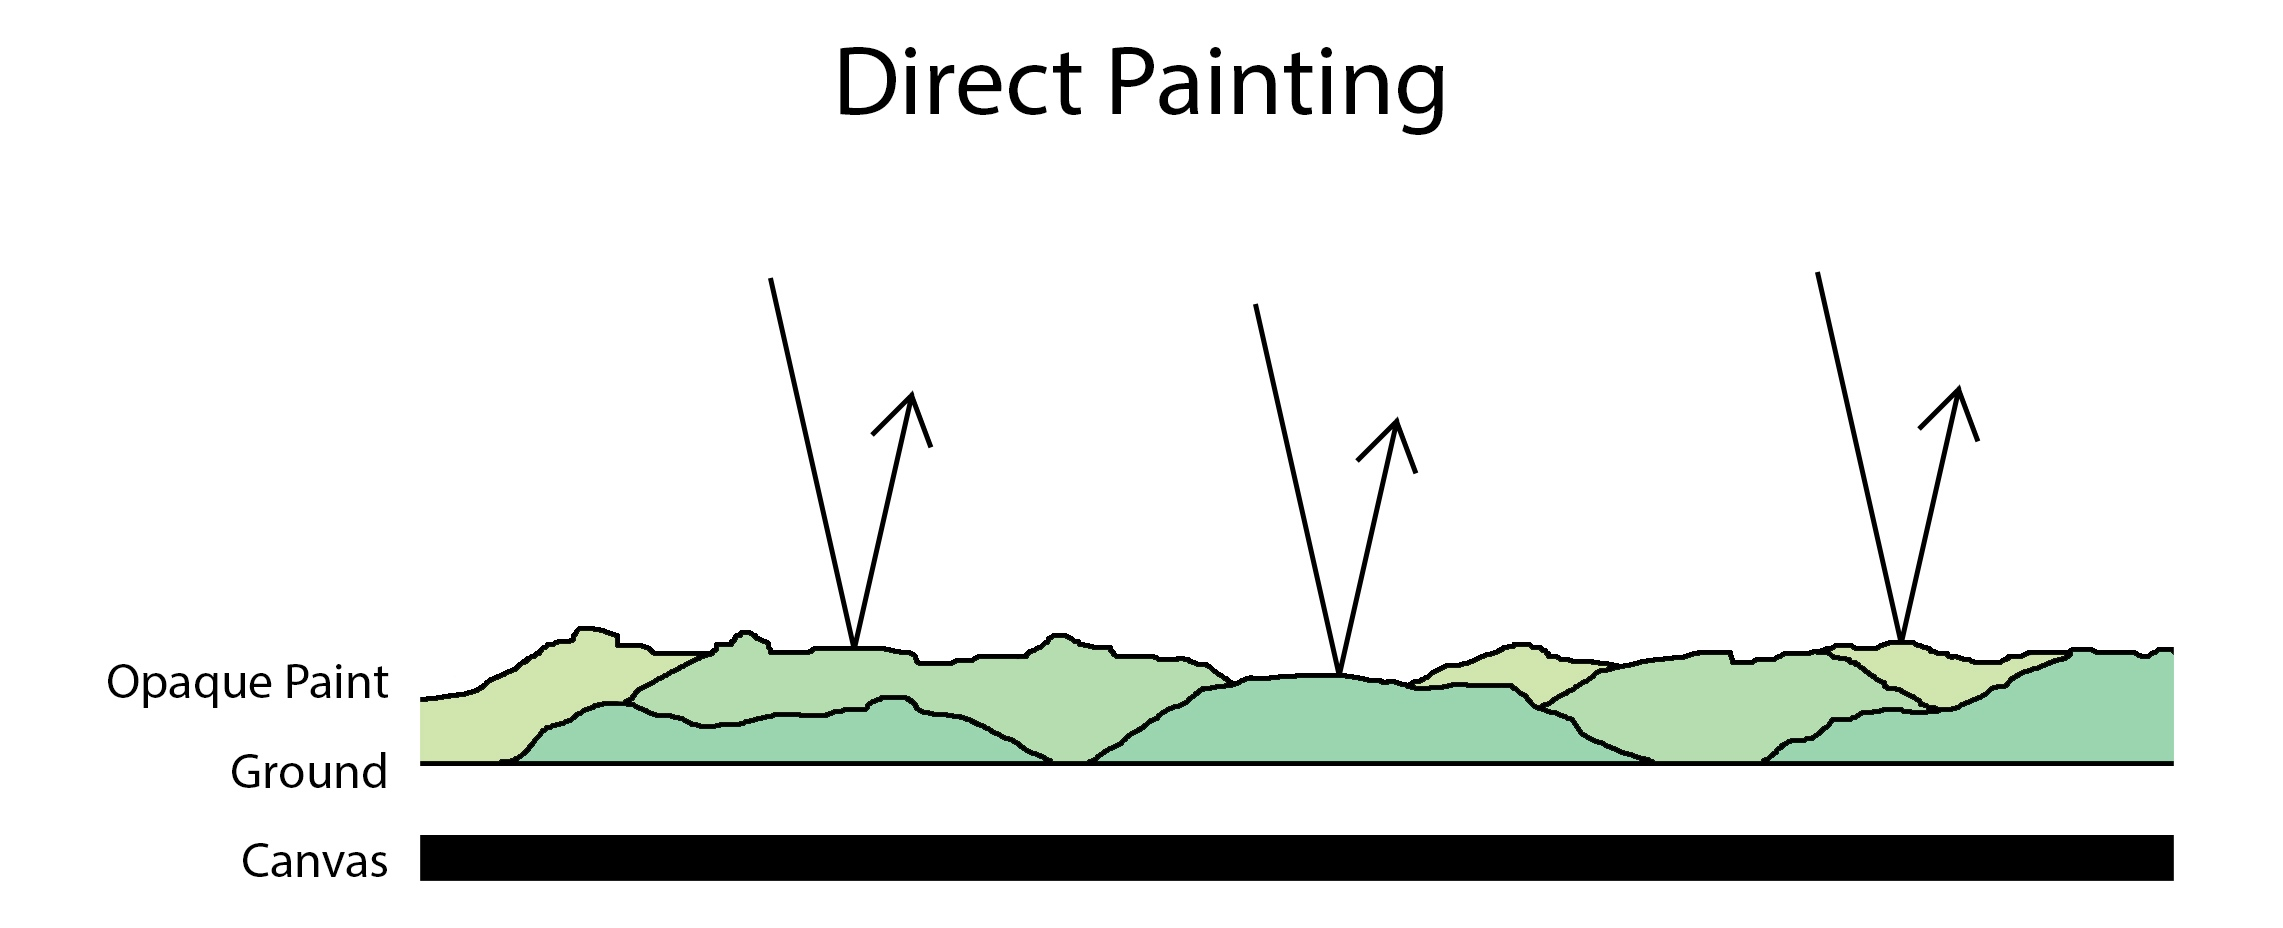 Direct Painting Illustration